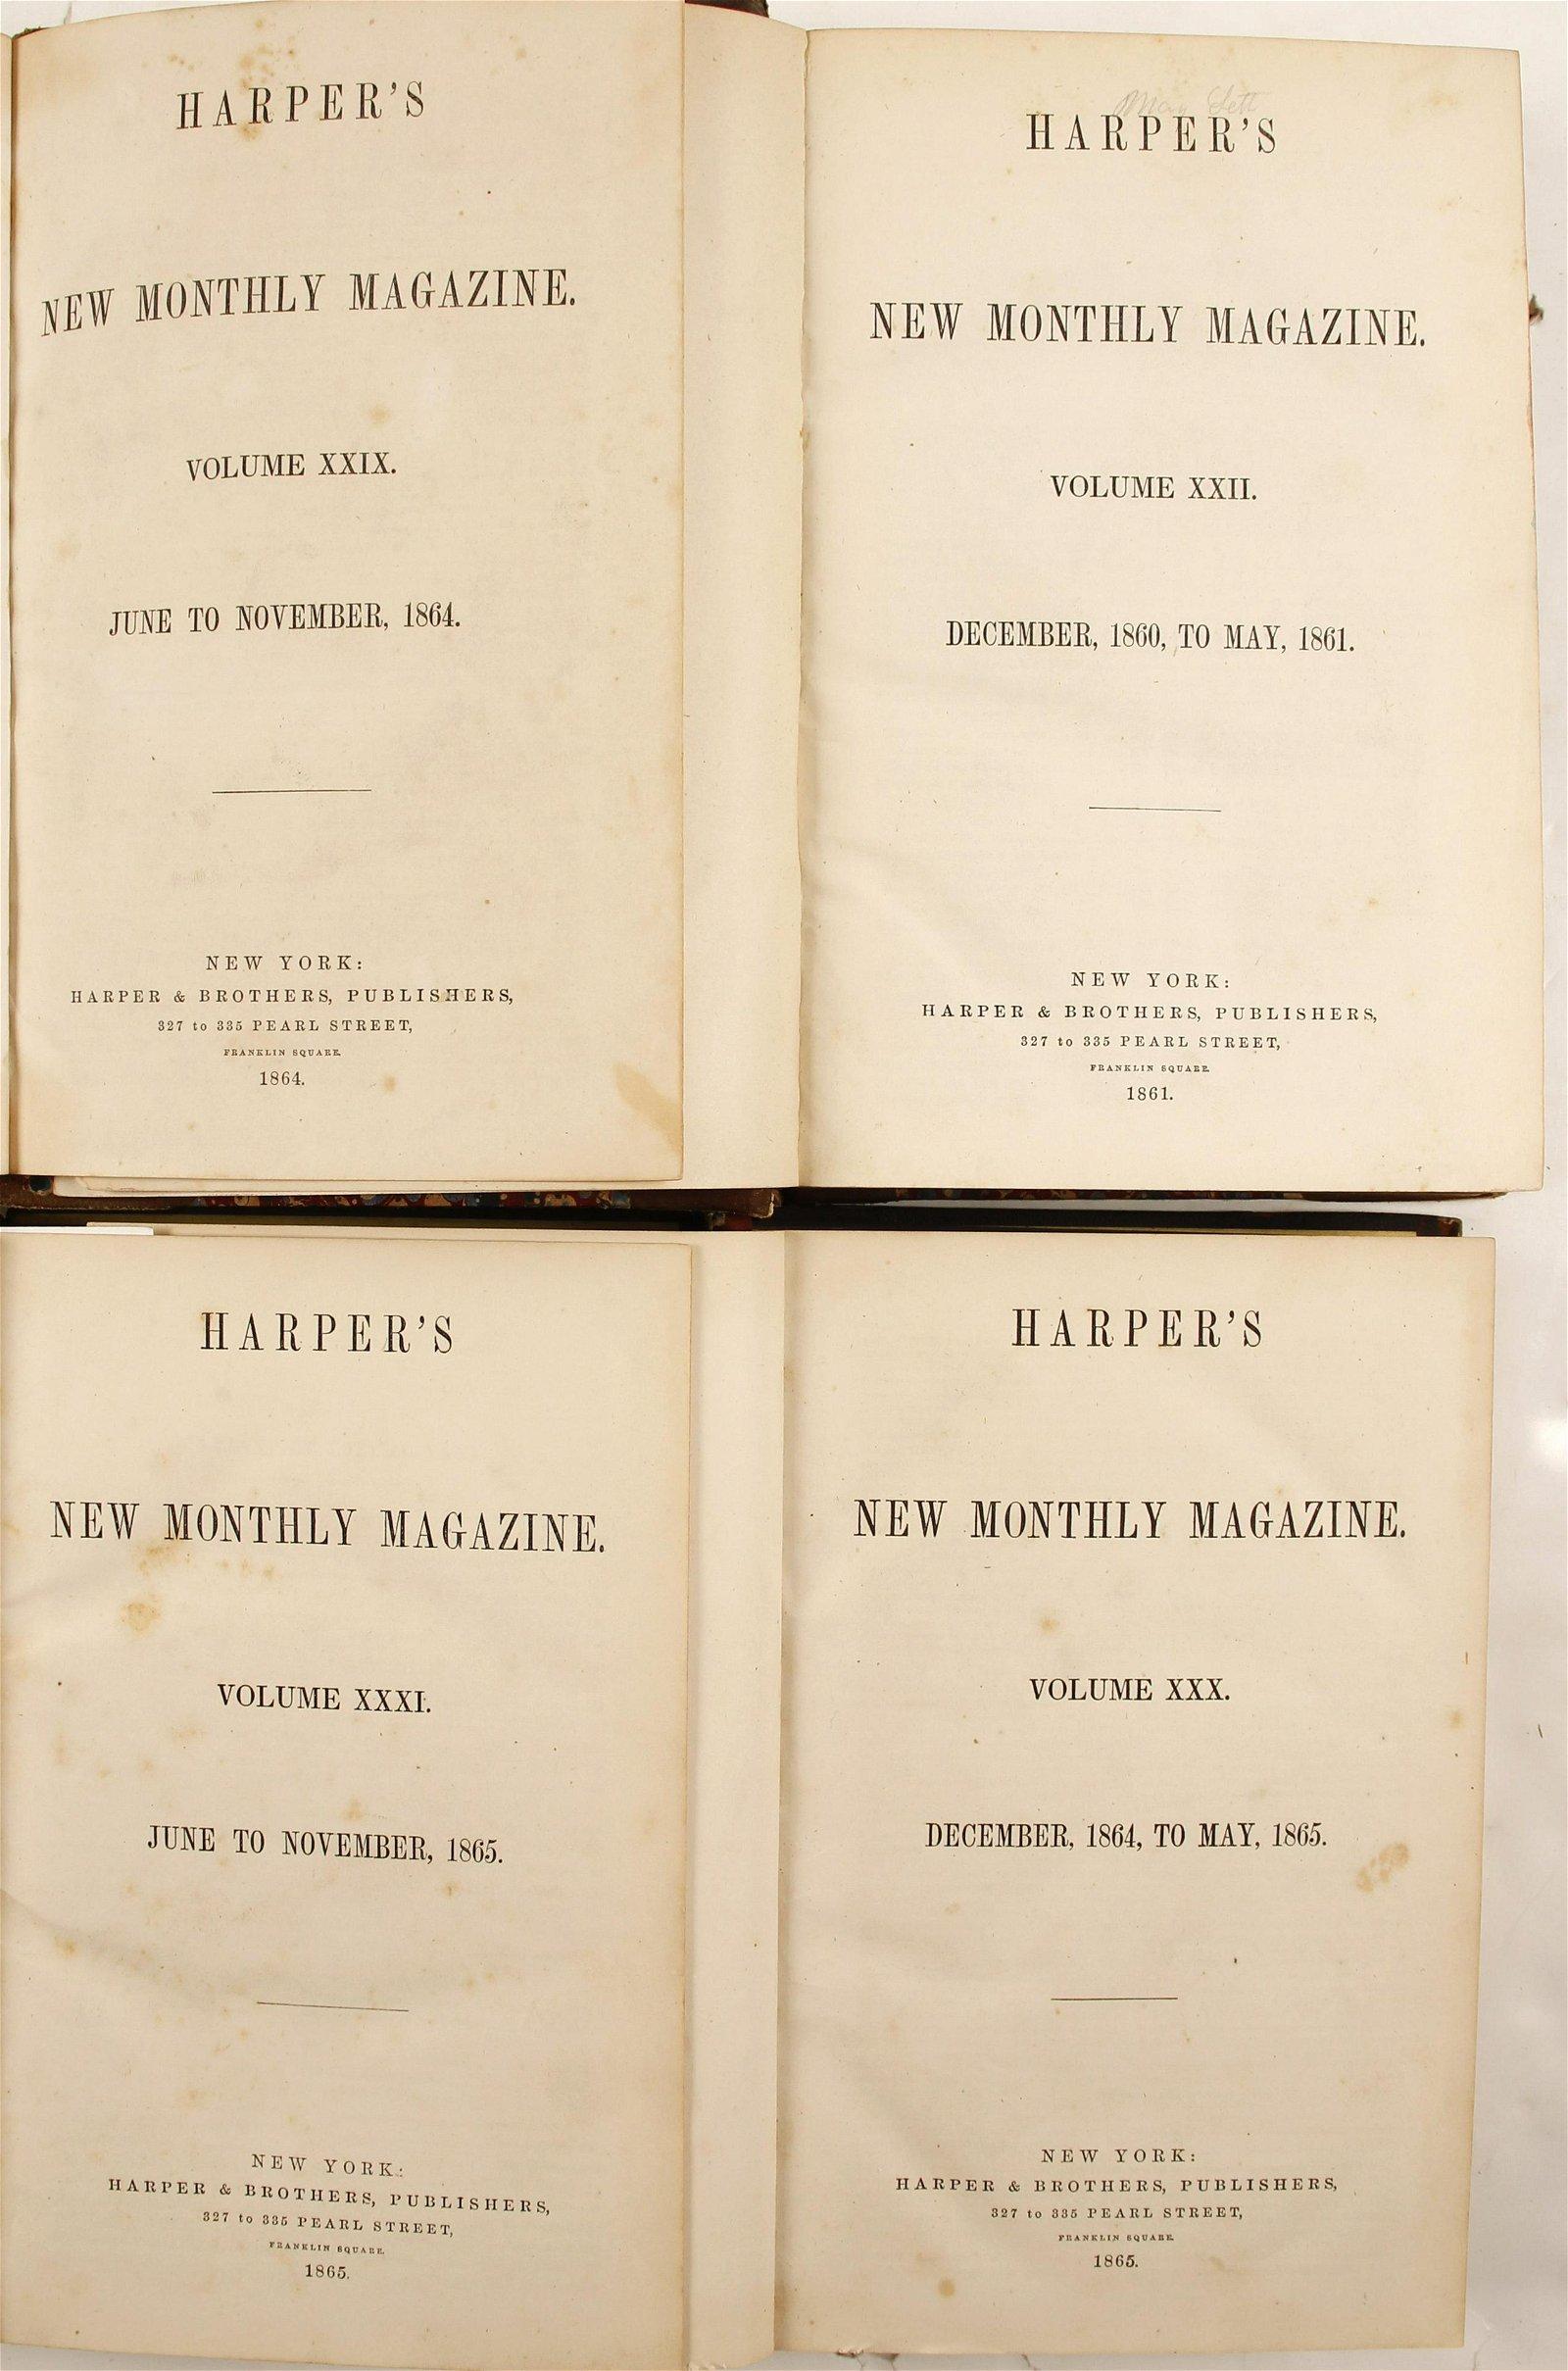 Harper's Magazine - Four Volumes on Nevada/Arizona by